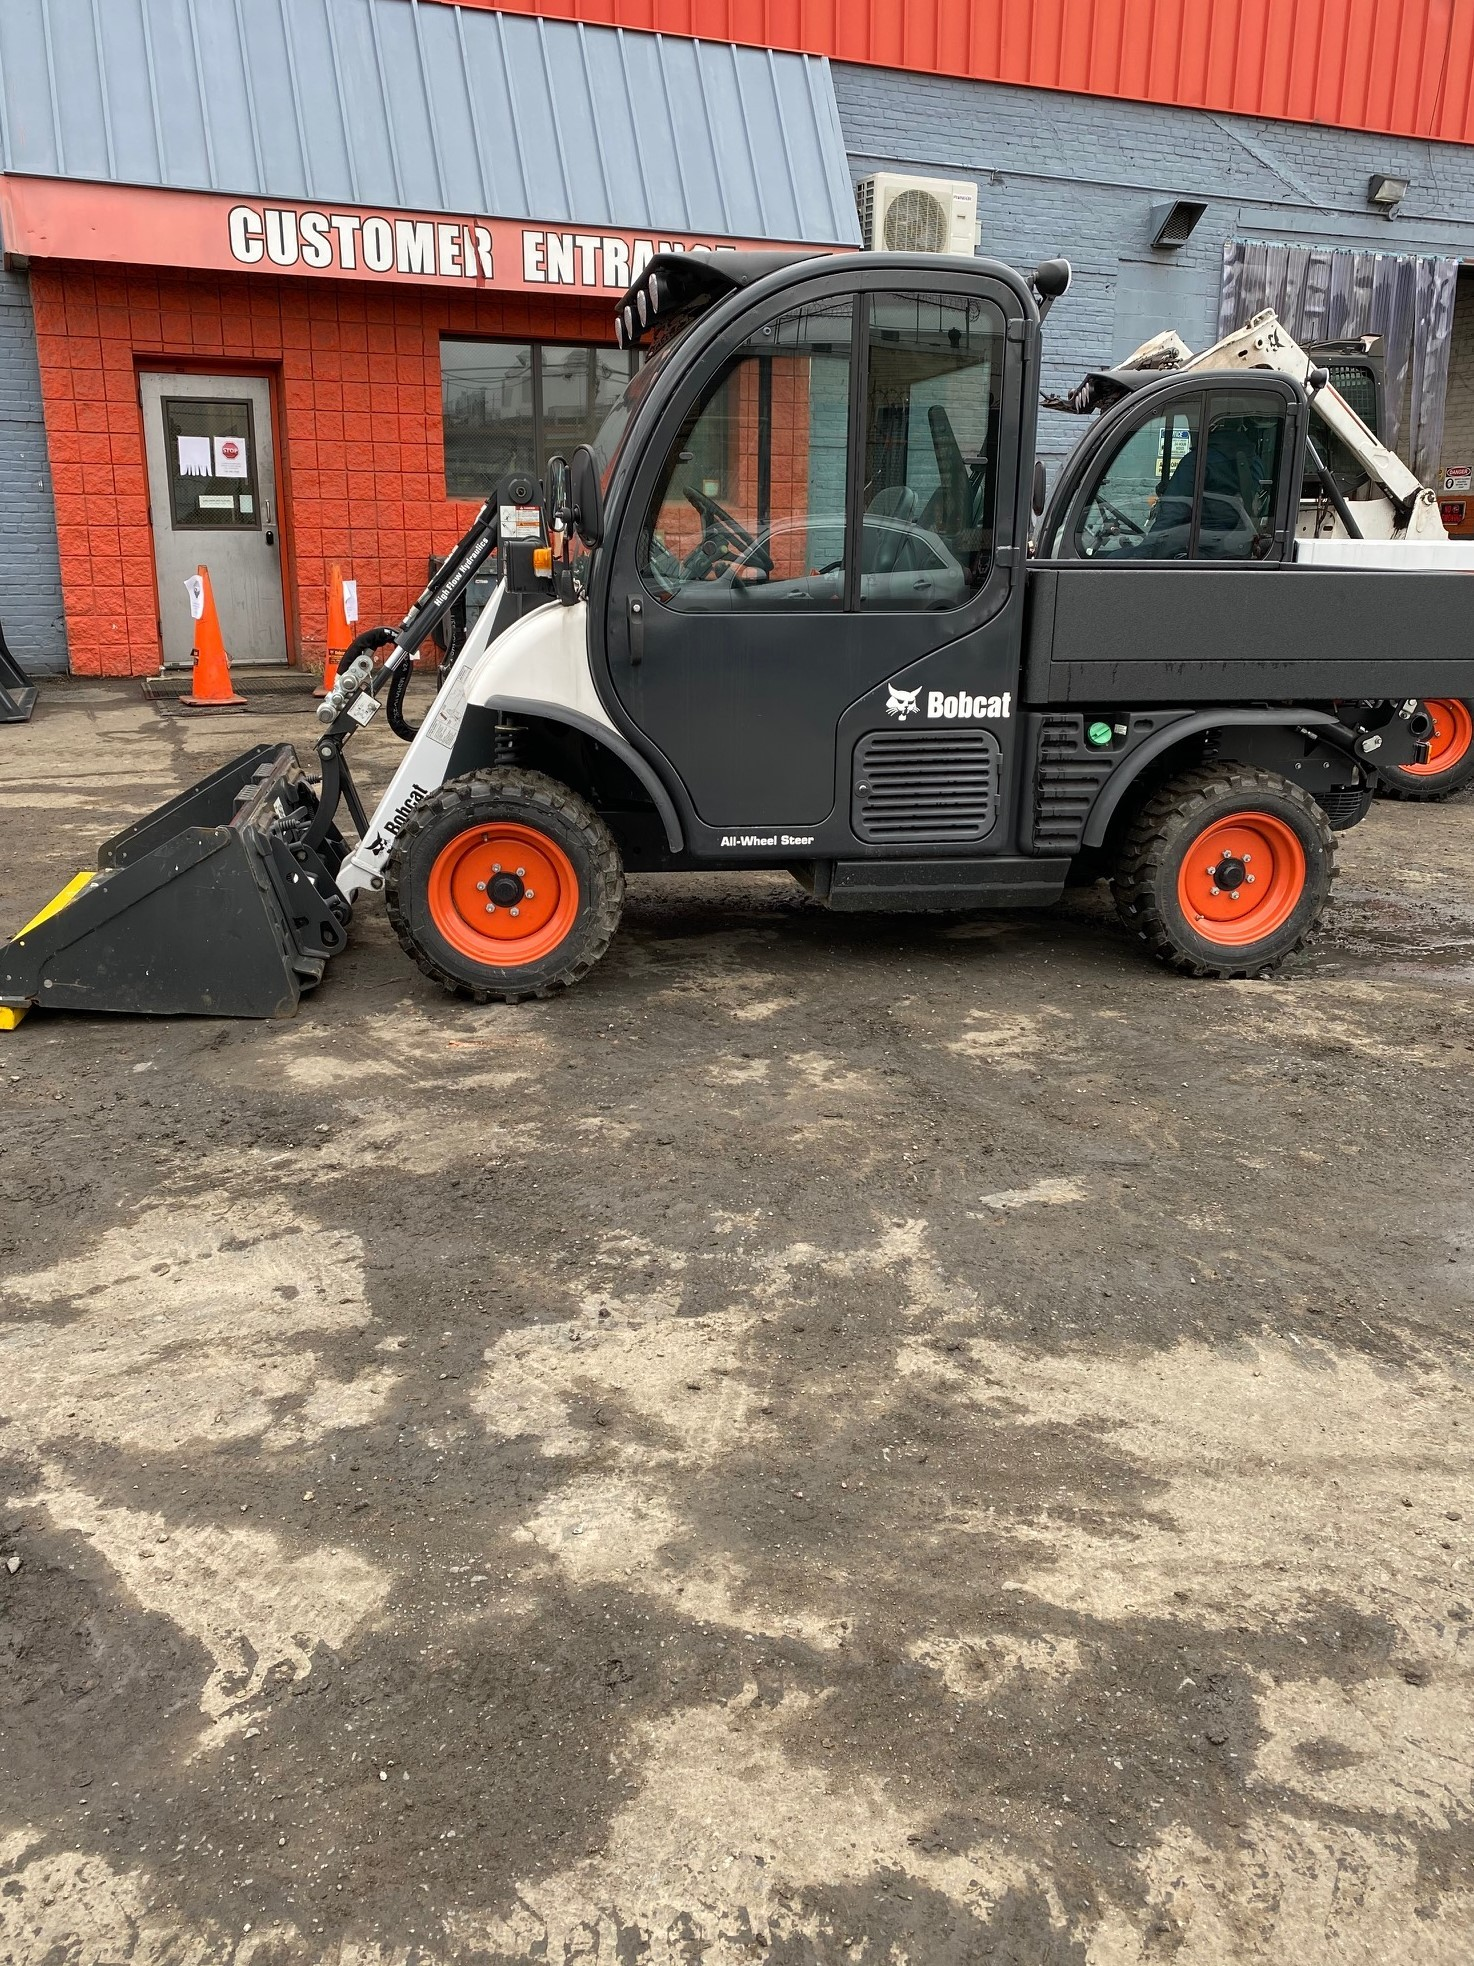 Used, 2018, Bobcat, 5600, Toolcat™ Work Machines